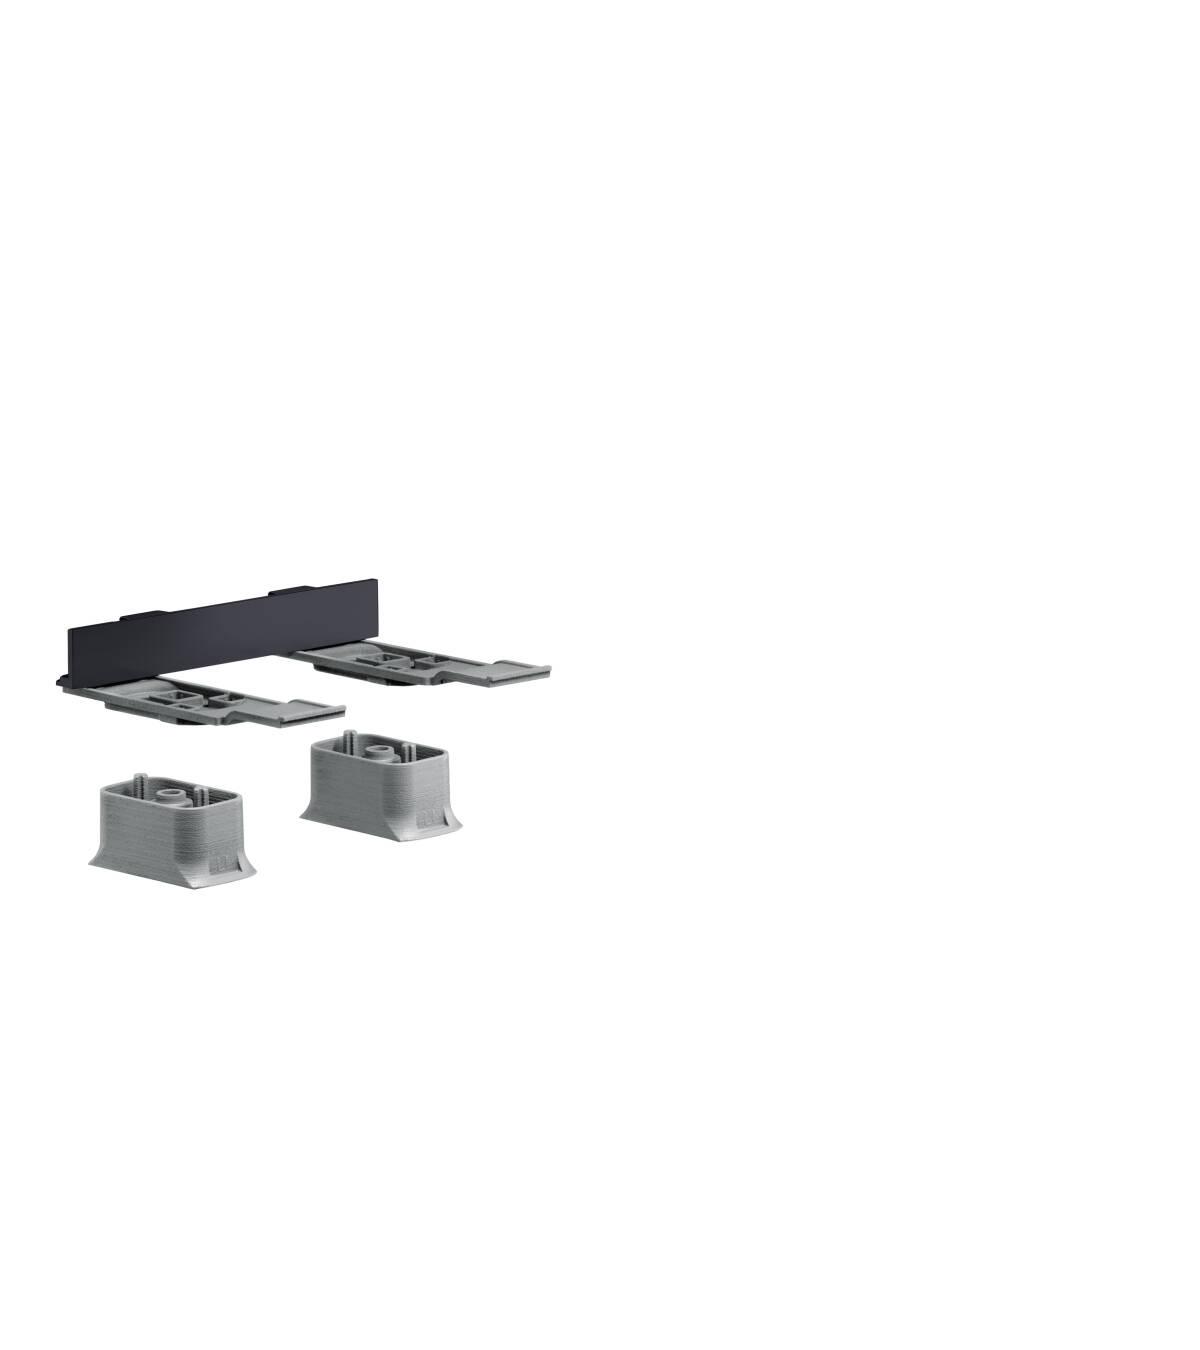 Adapter set, Satin Black, 42870350